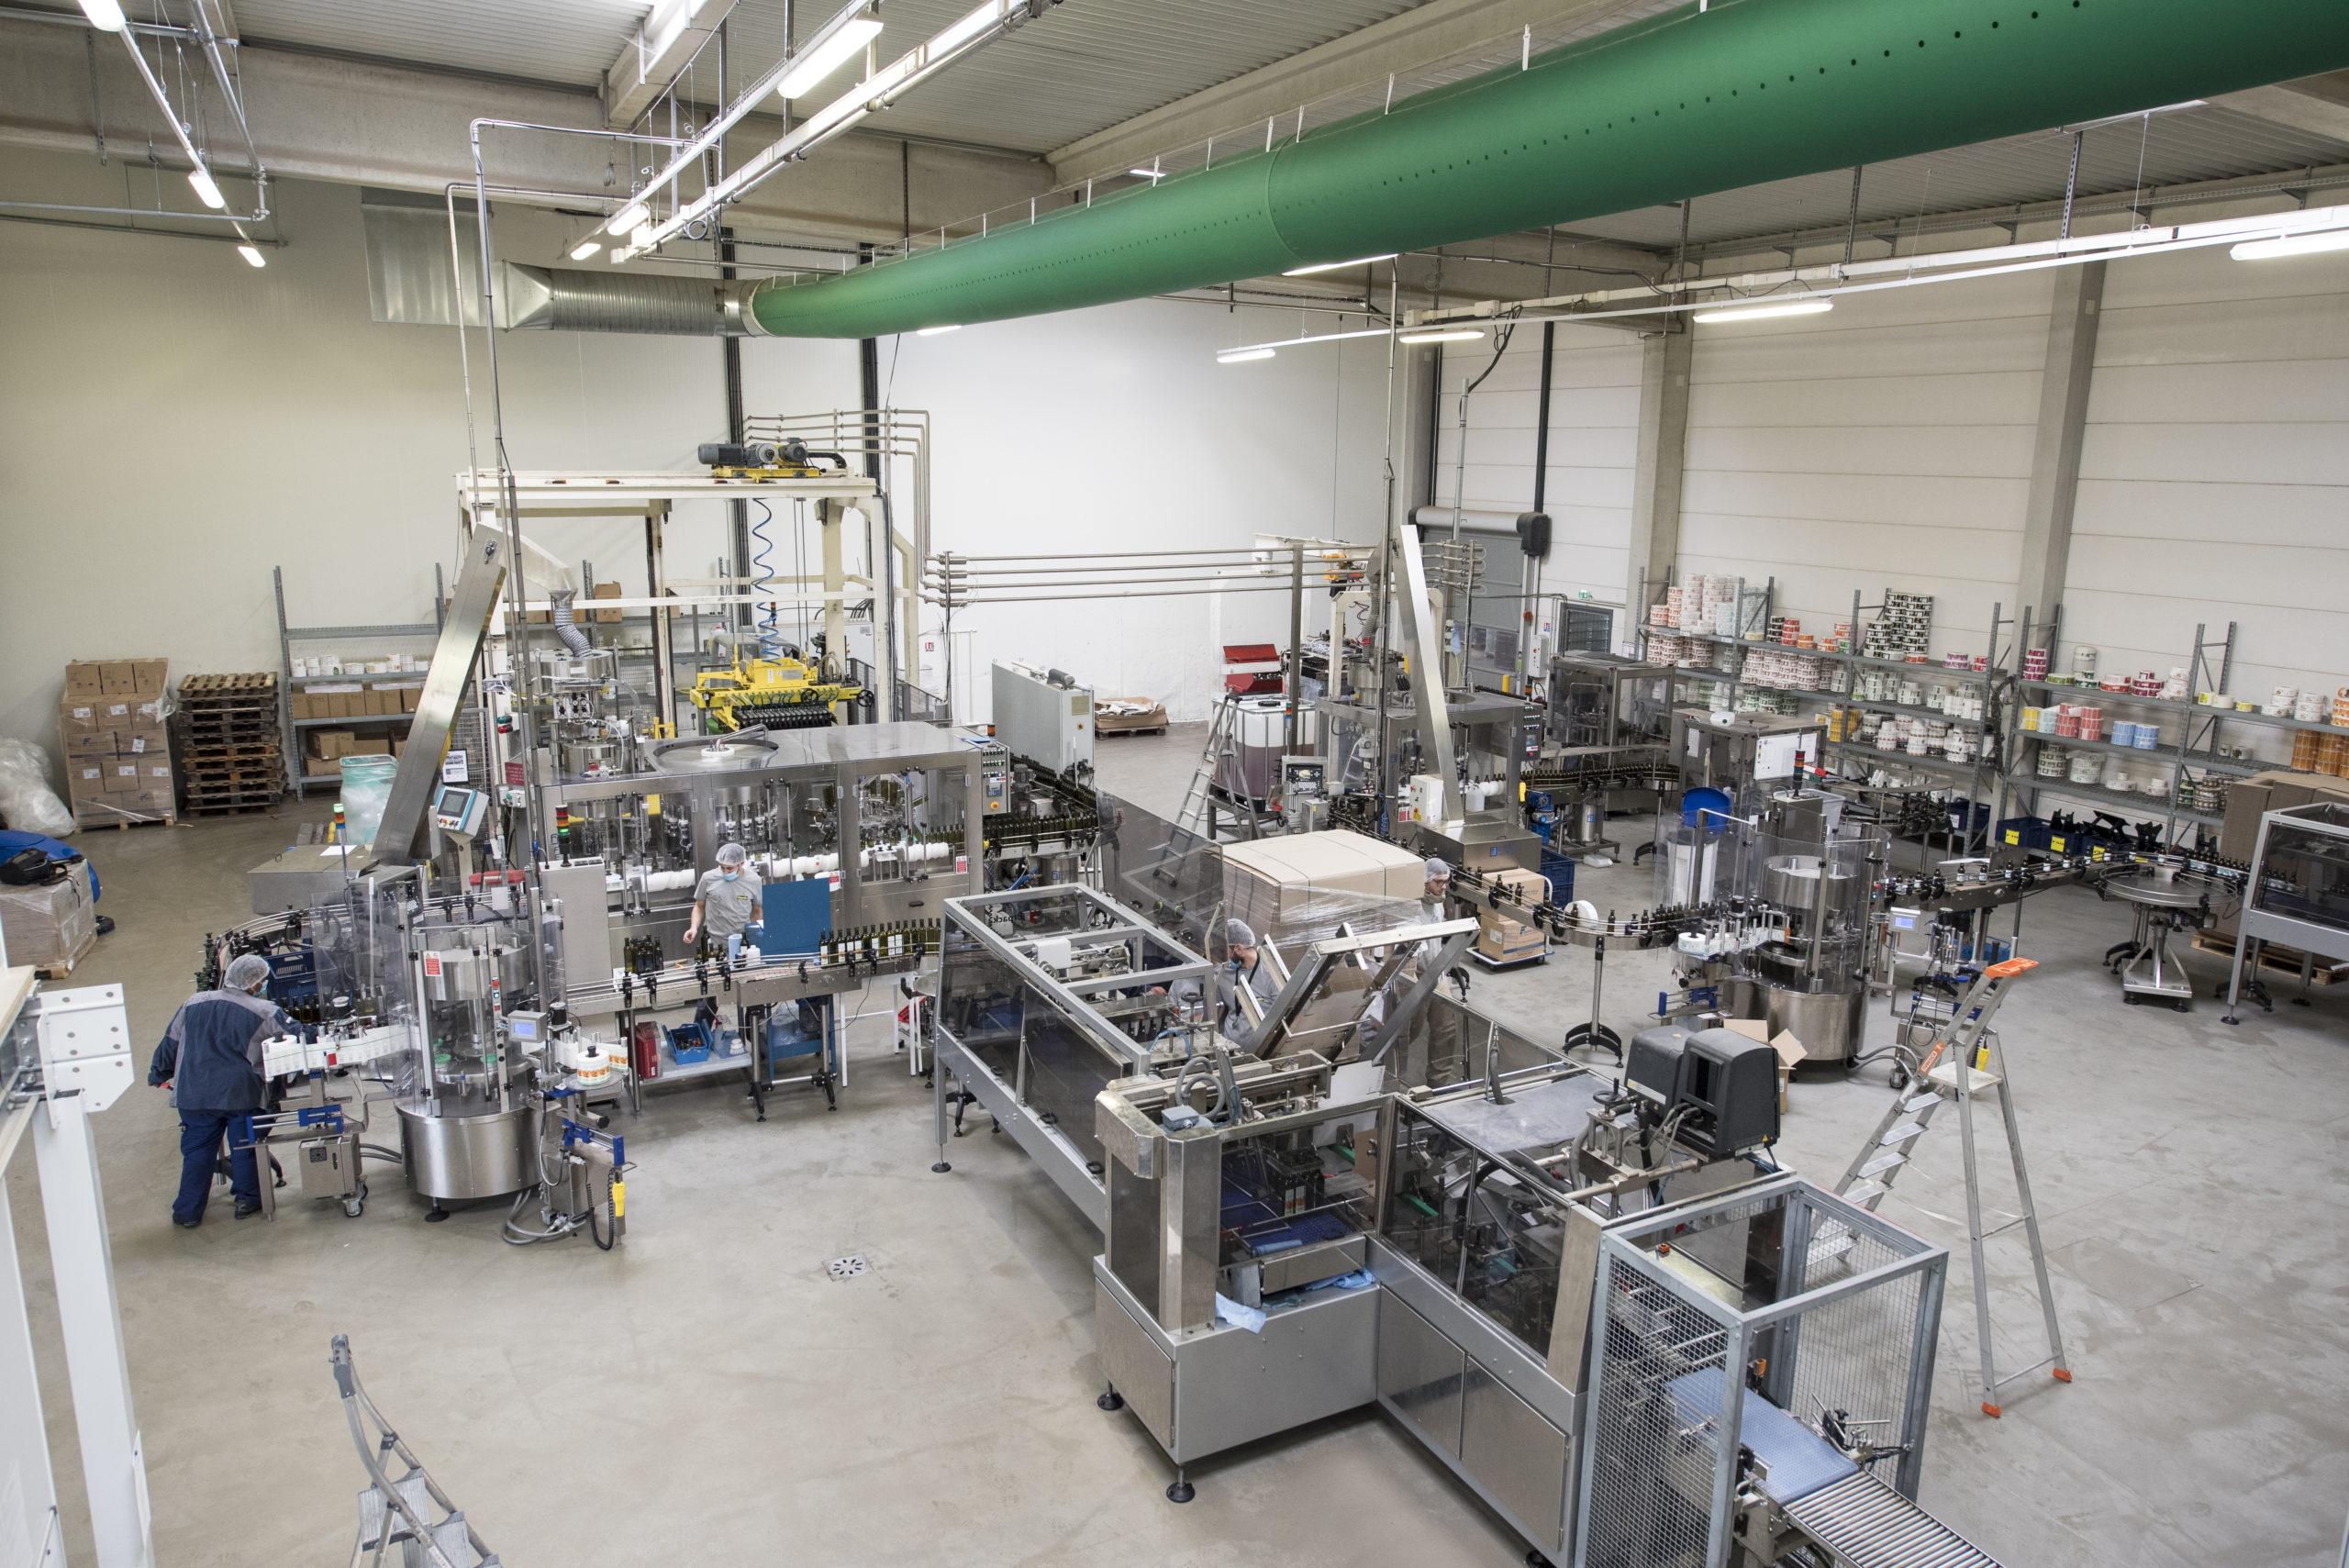 Alternation production department